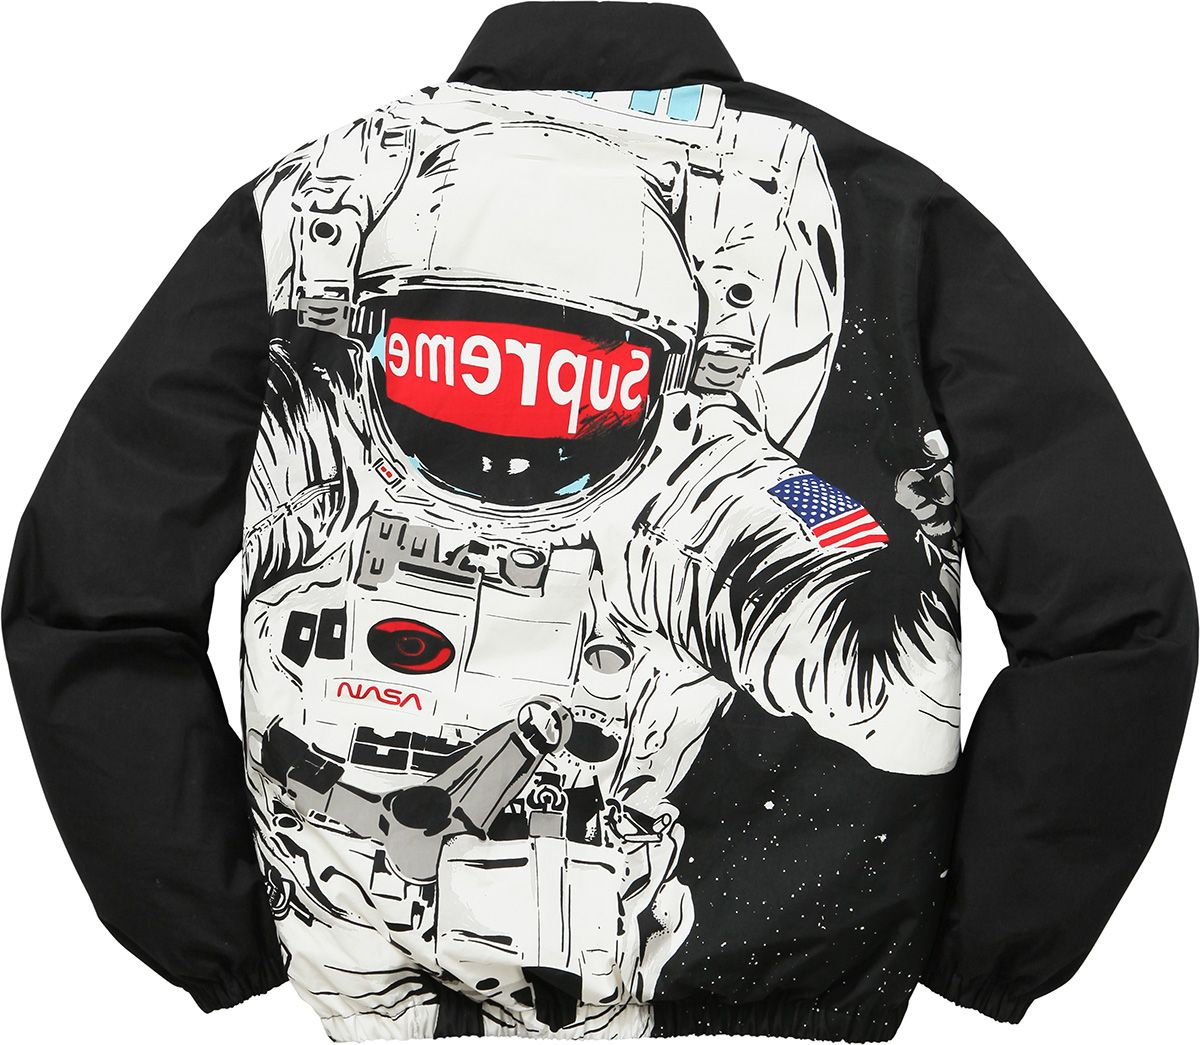 16AW Supreme Astronaut Puffy Jacket 2016.10.29 | Supreme